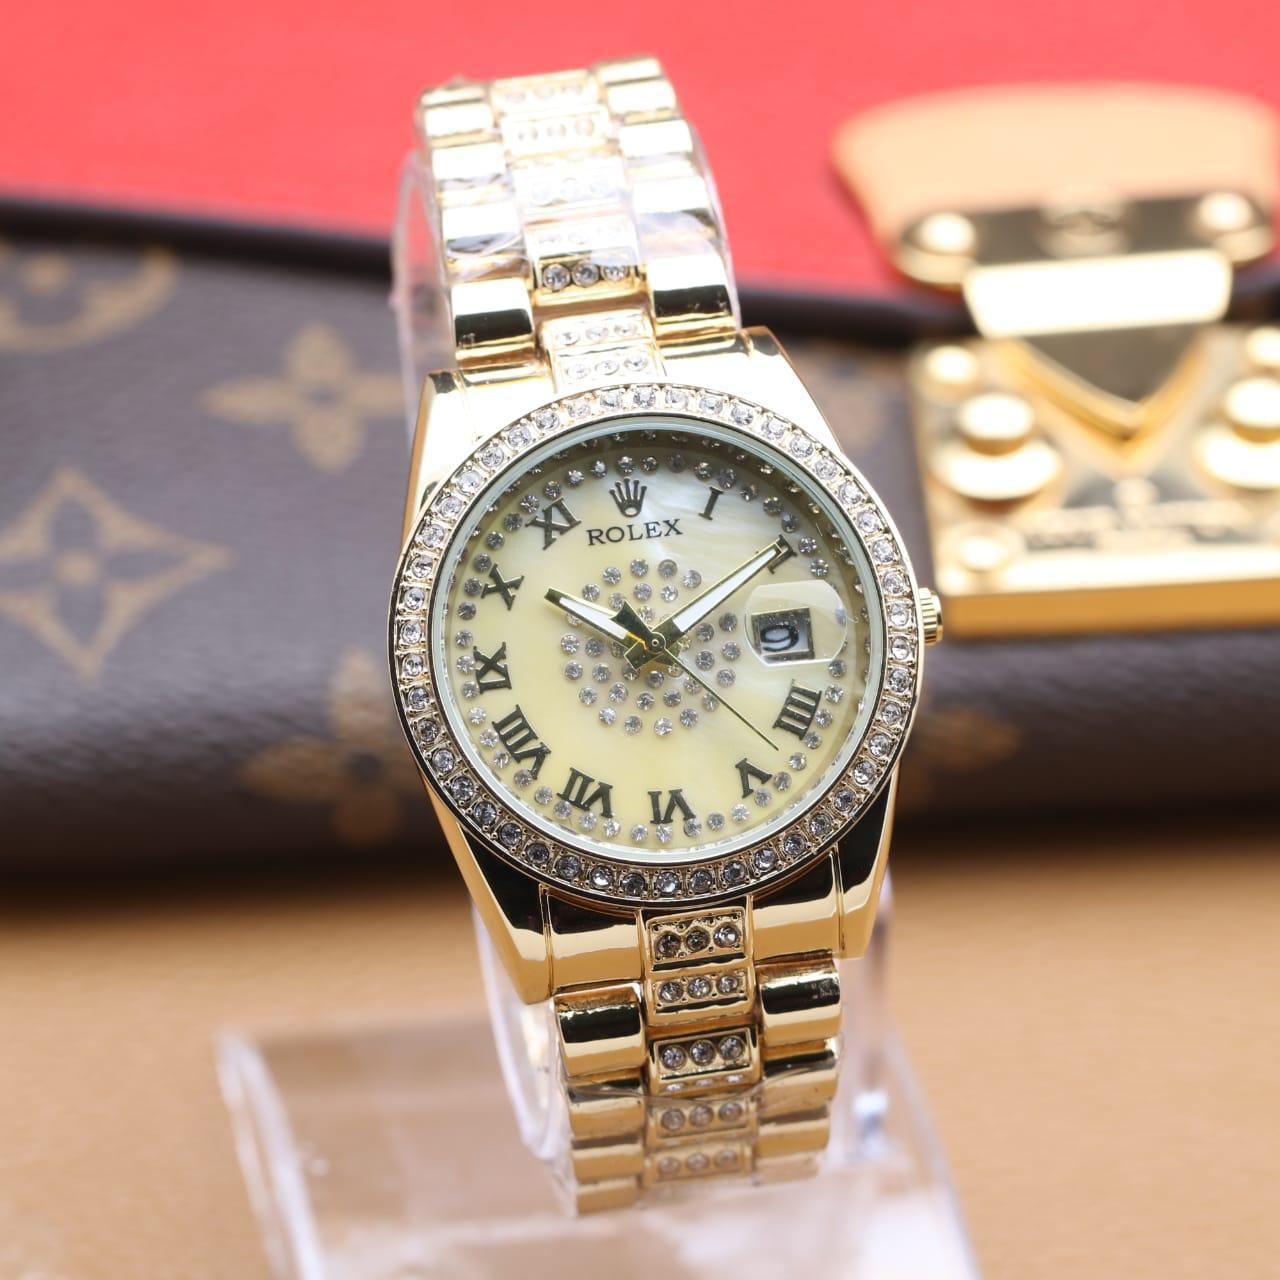 Jam Tangan Wanita Analog Rolex Crystal / Watch Analog Rolex 1